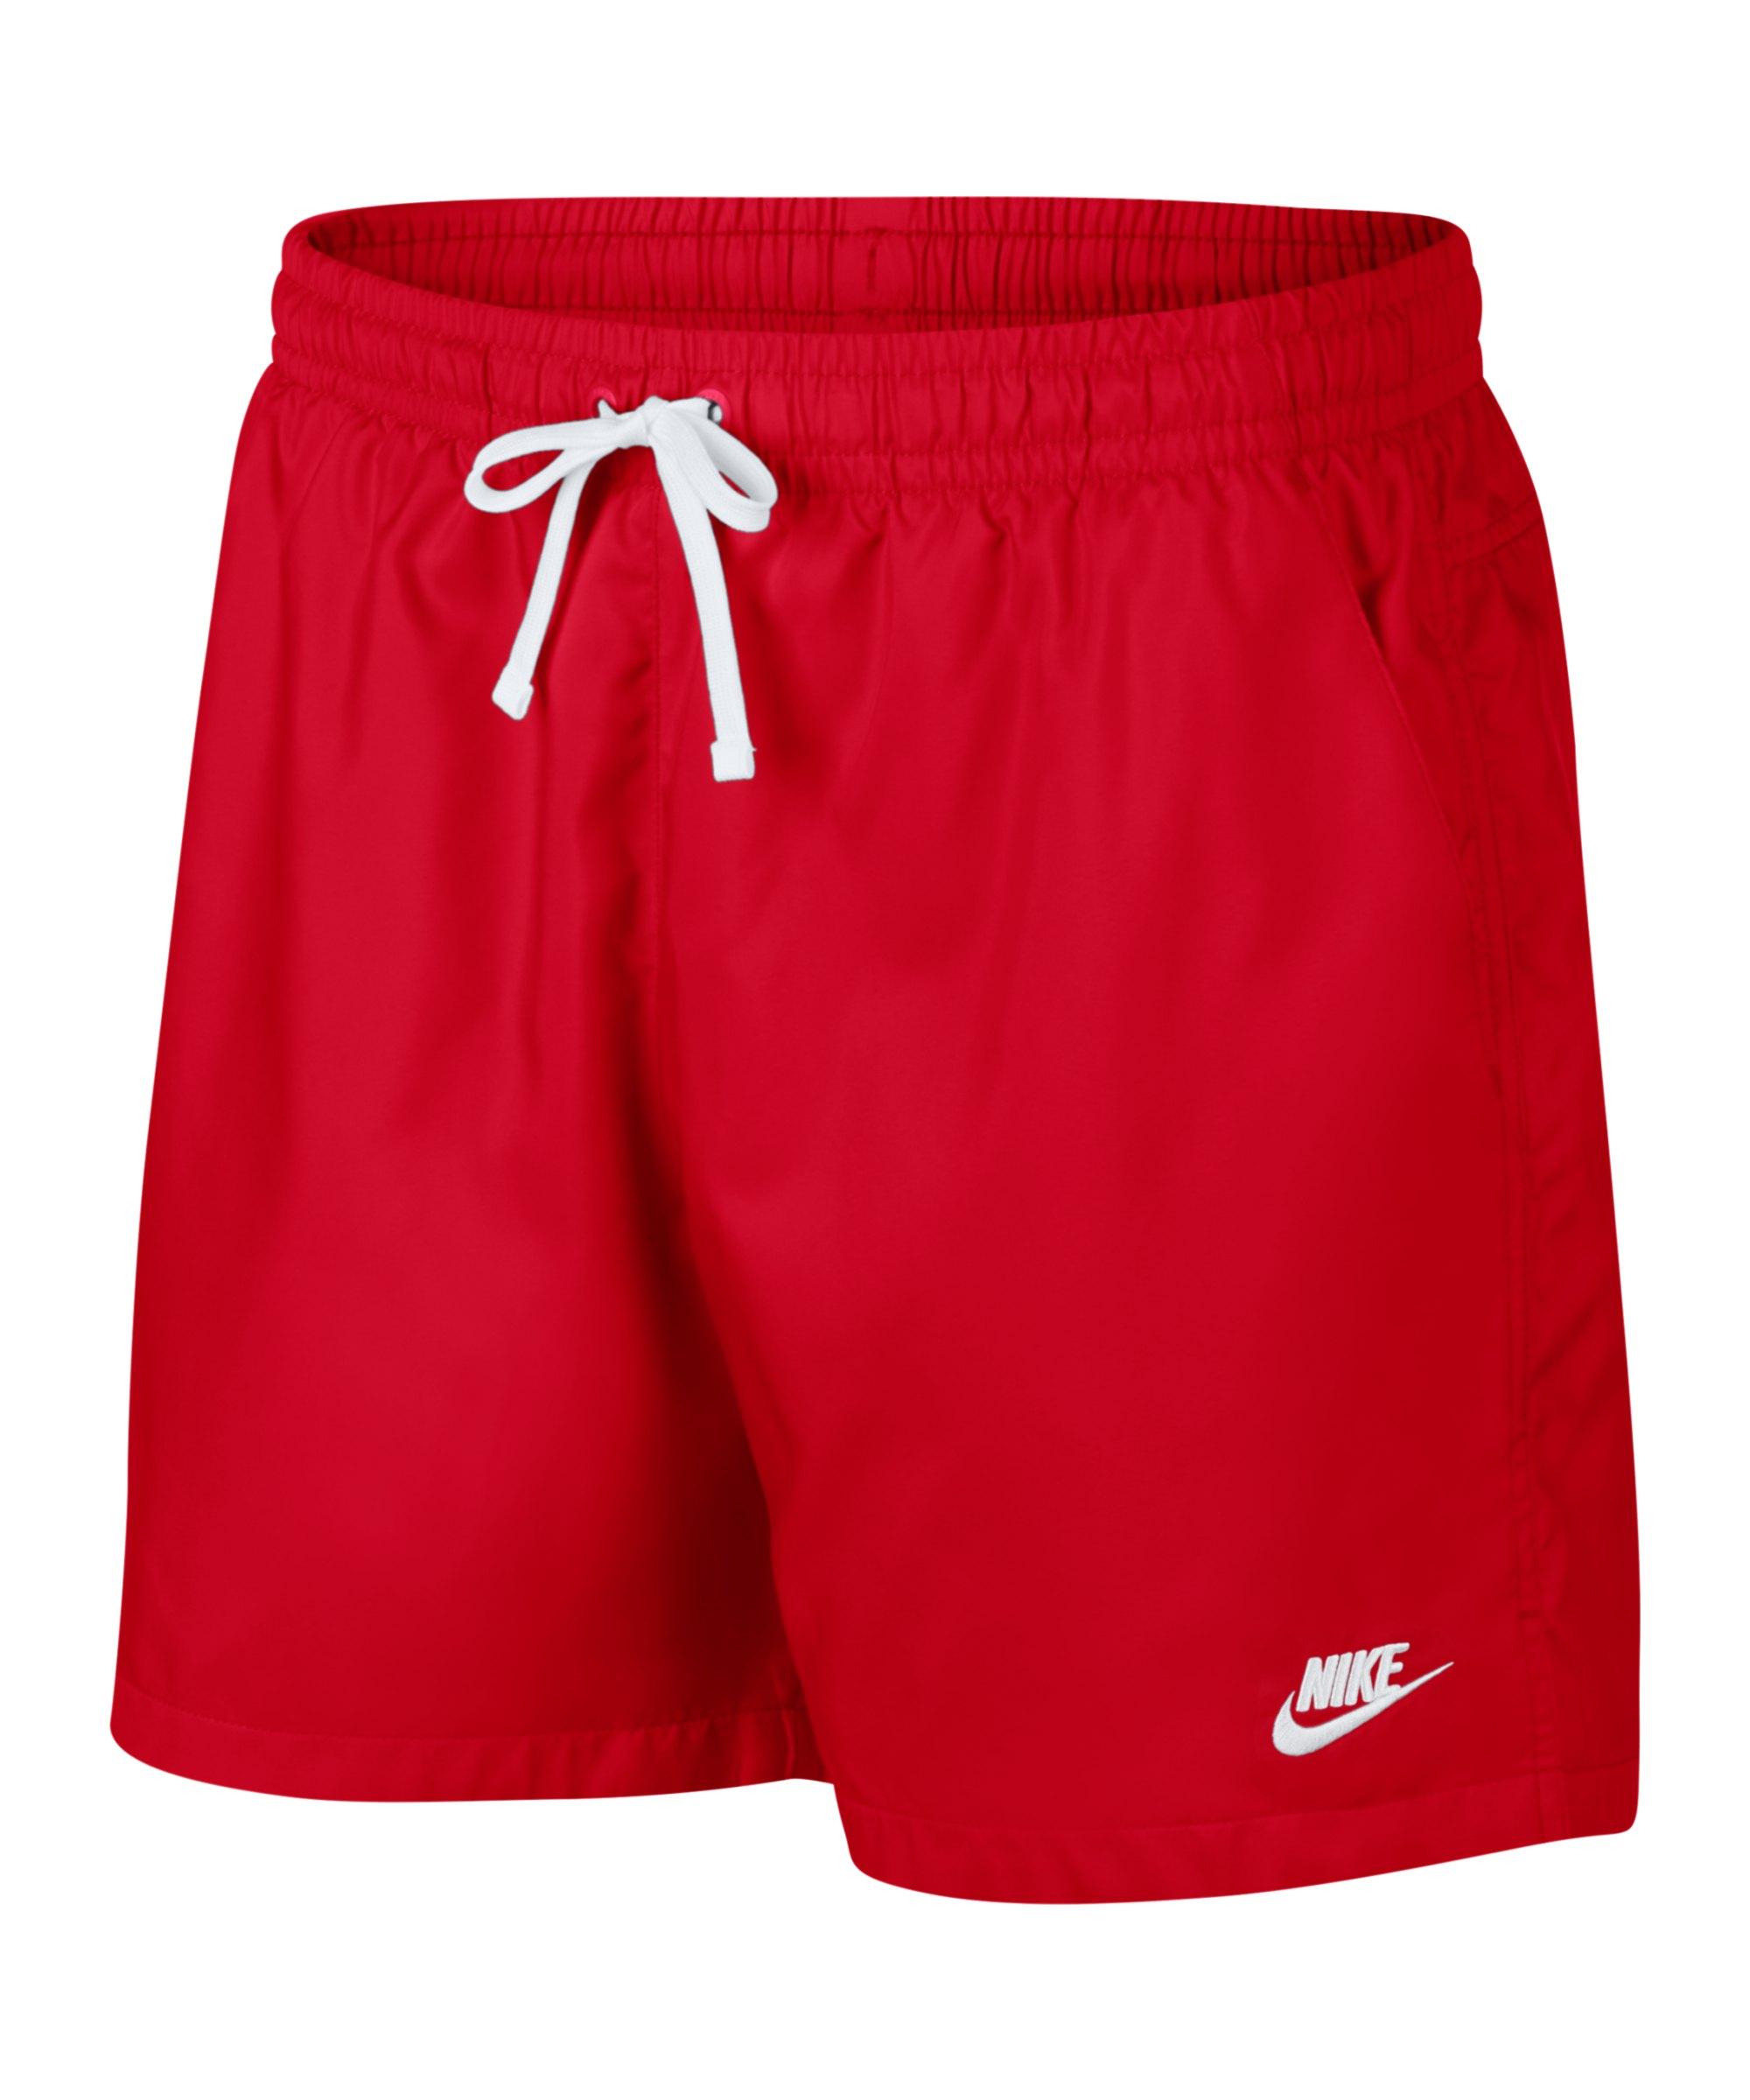 Nike Woven Short Rot Weiss F657 - rot